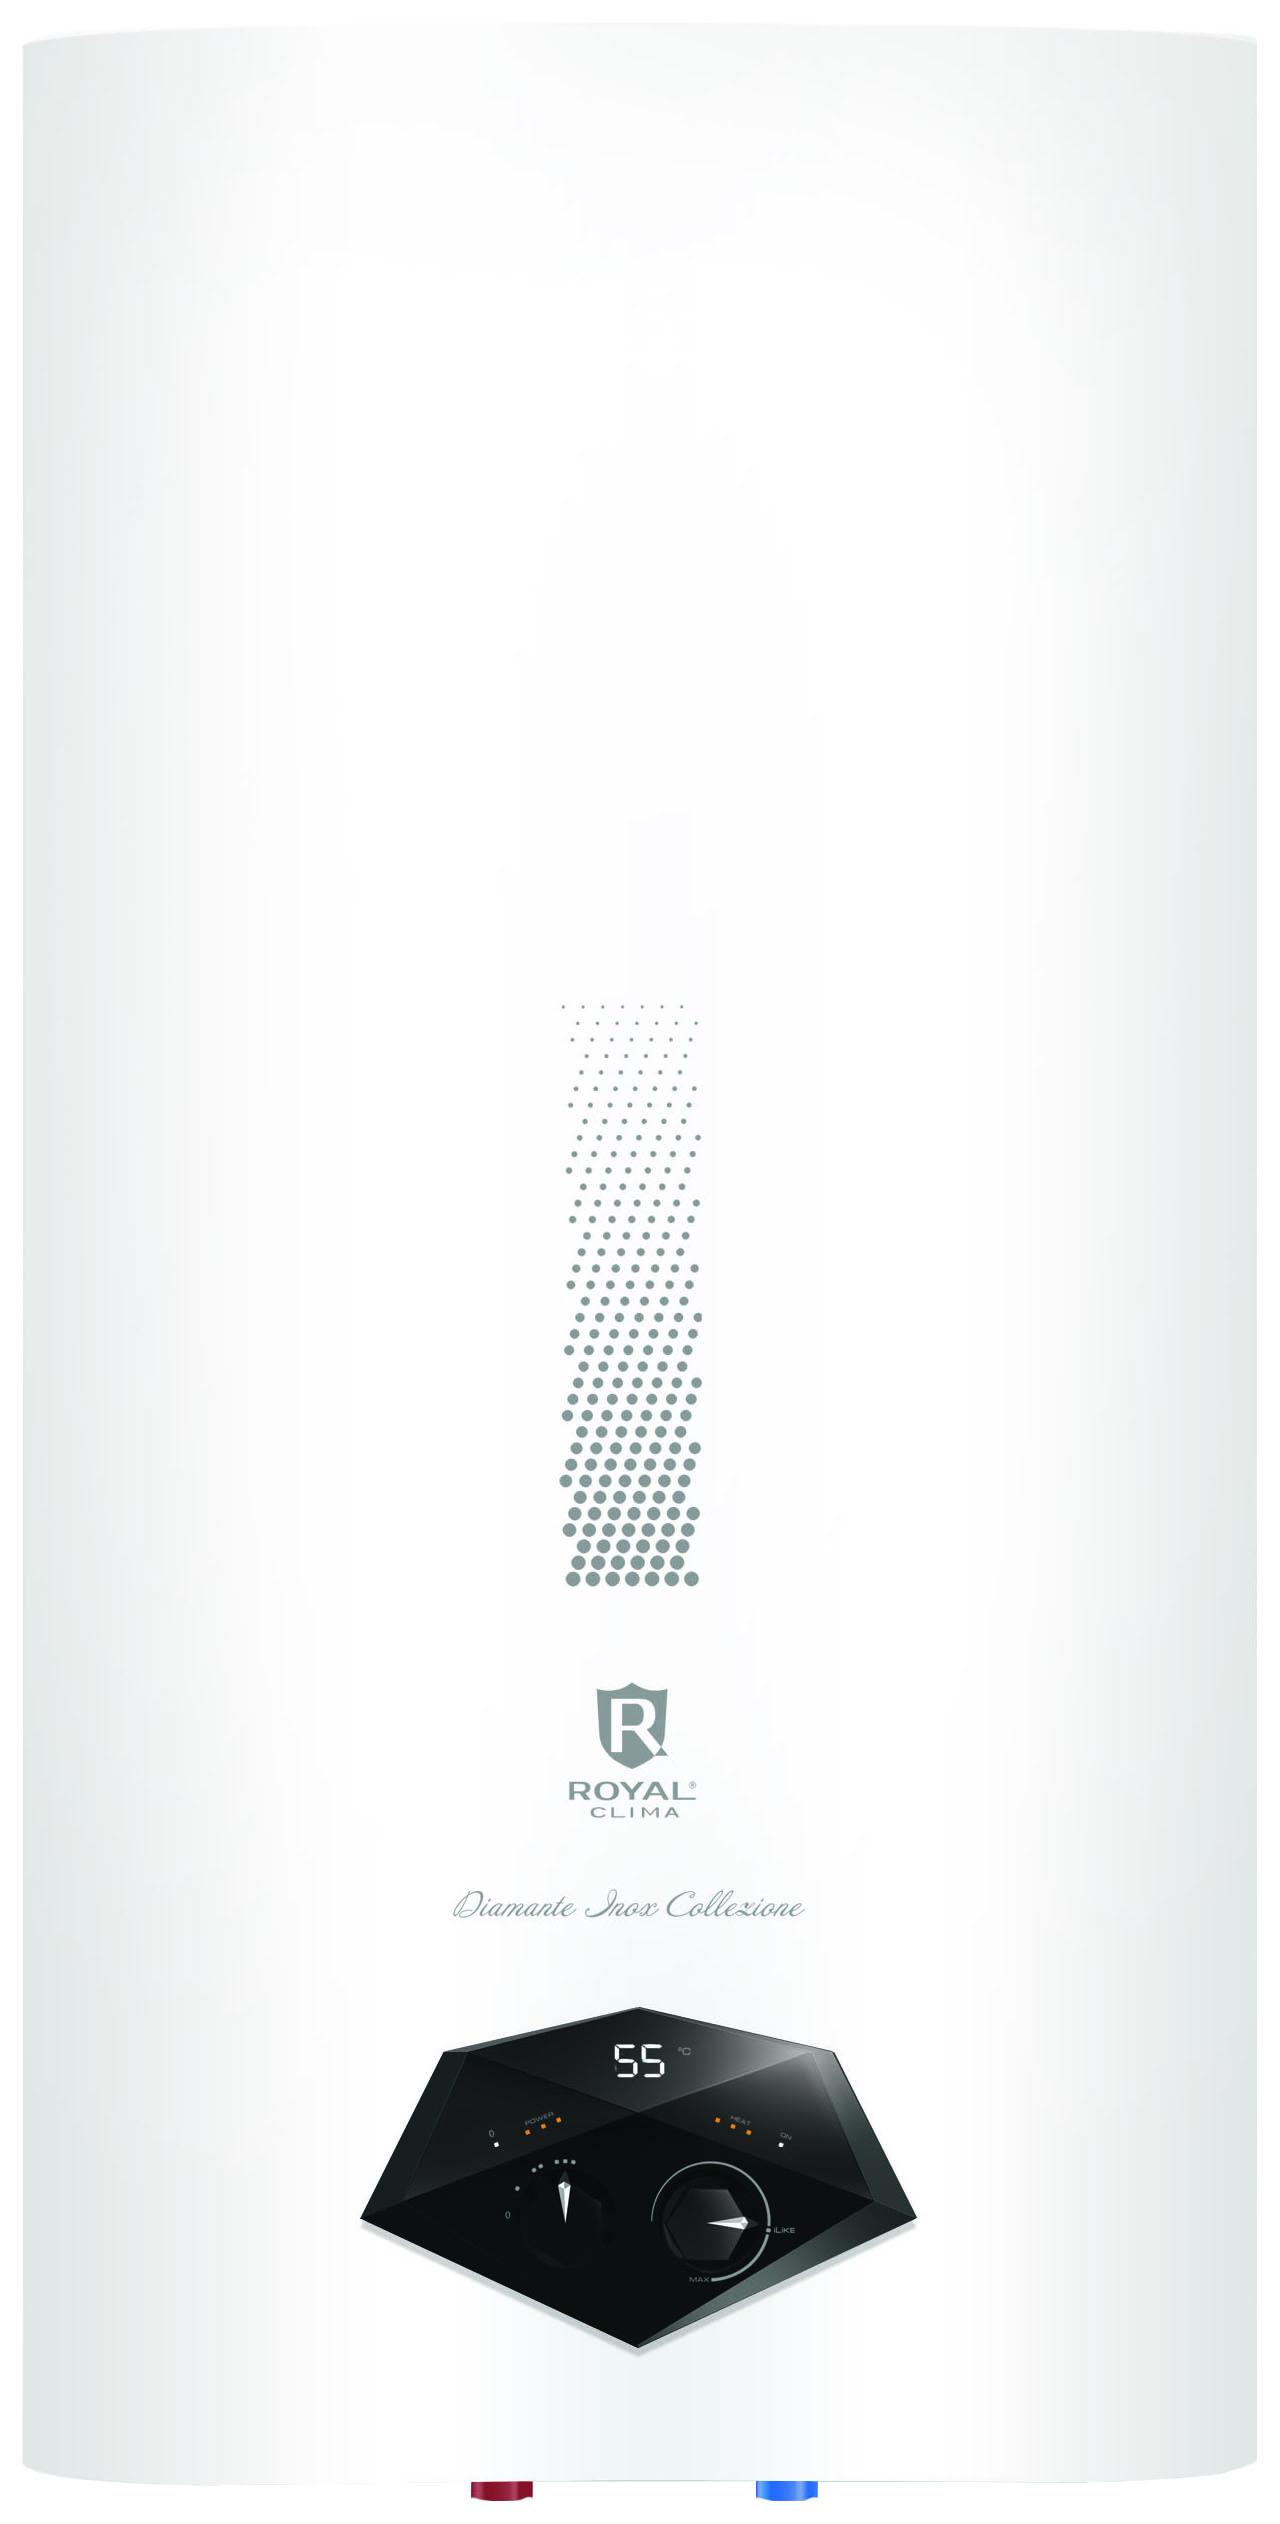 Водонагреватель накопительный ROYAL Clima Diamante Inox Сollezione RWH-DIC80-FS white